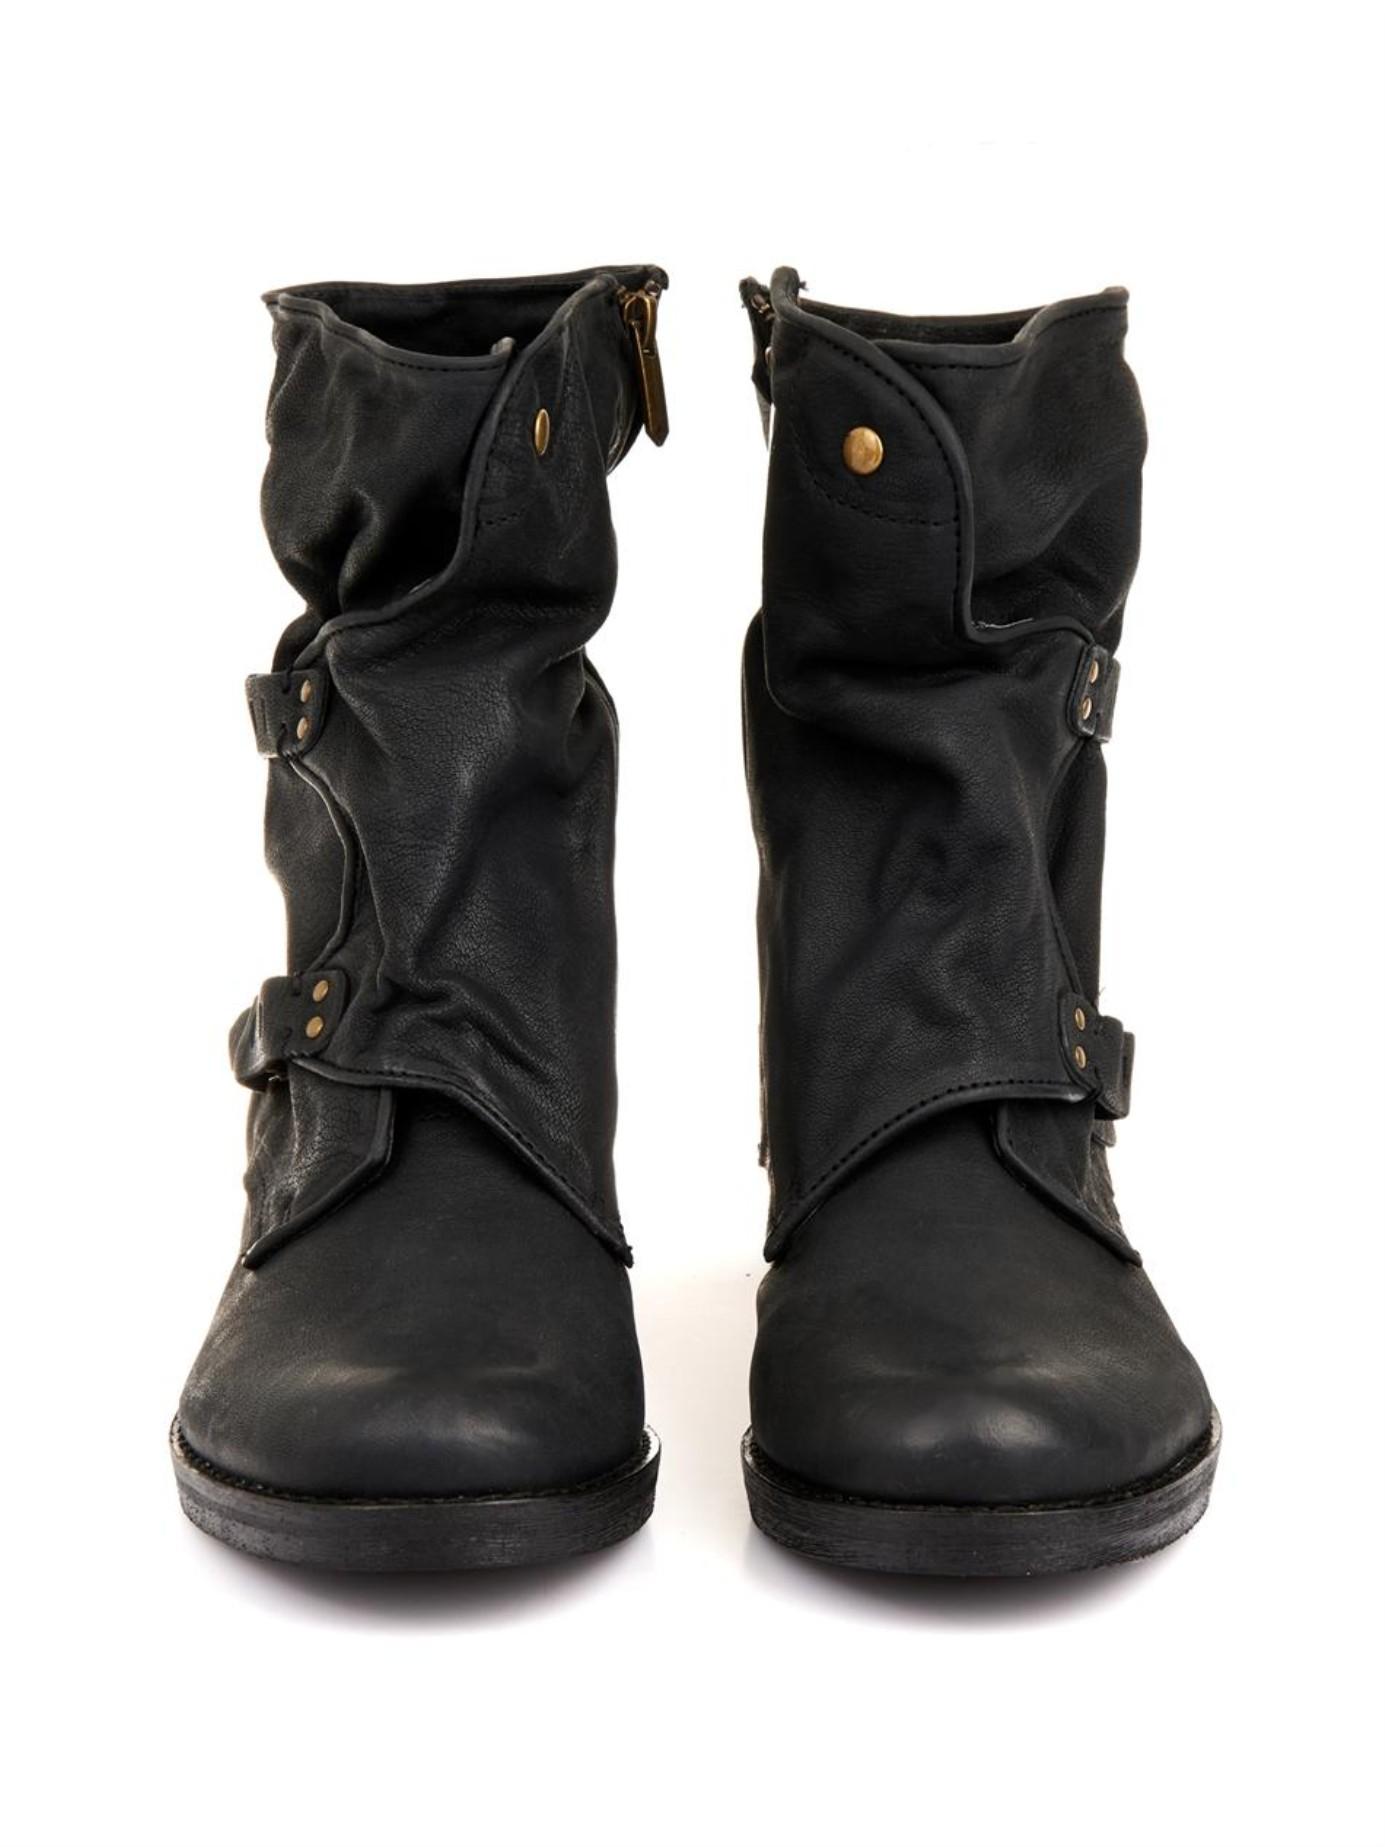 da1cdeb2127b Lyst - Sam Edelman Ridge Leather Boots in Black